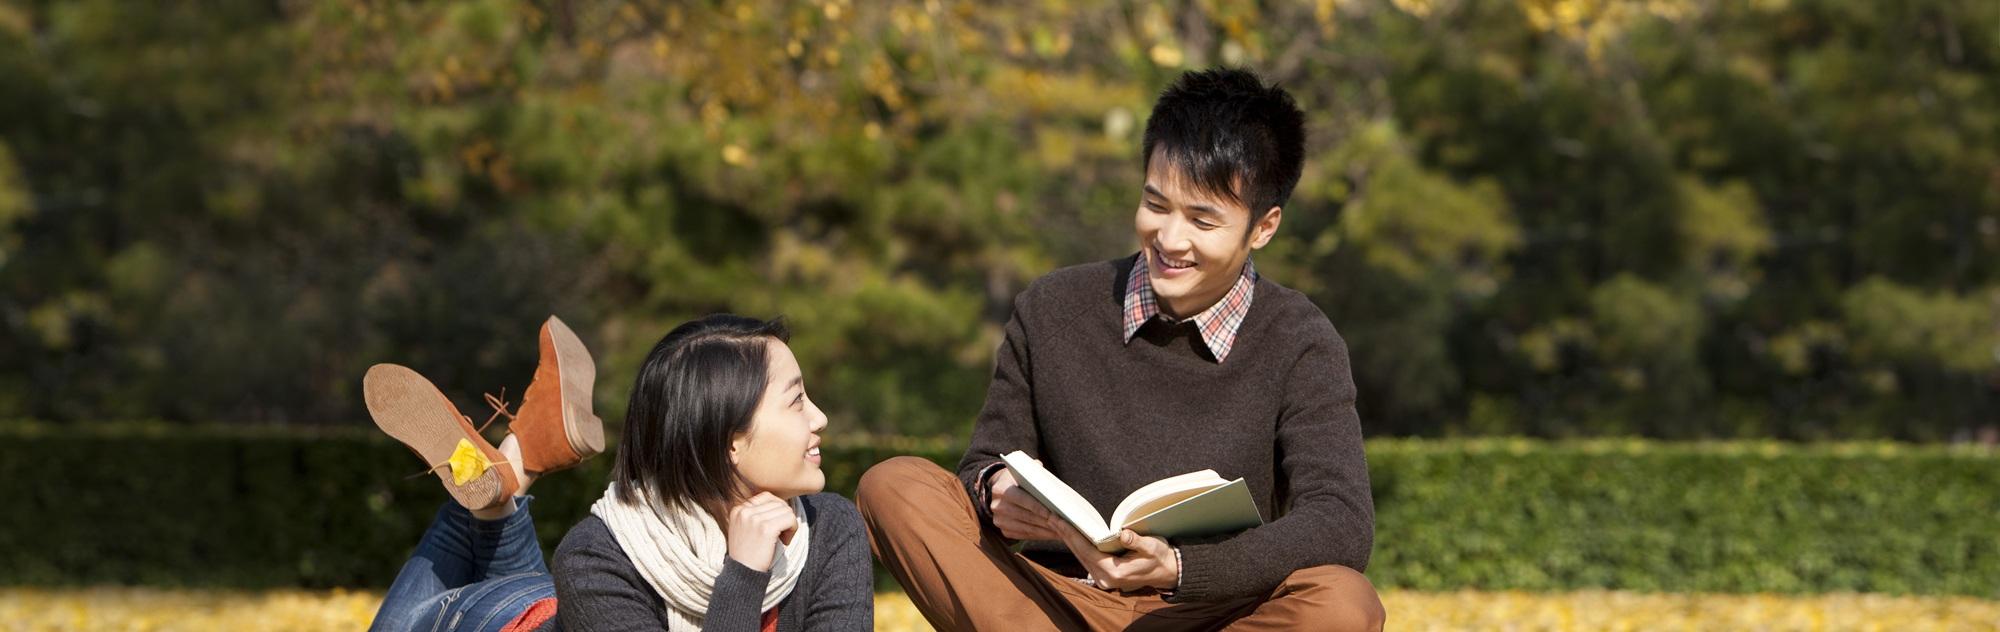 Overseas Student Travel Insurance | AIG Malaysia